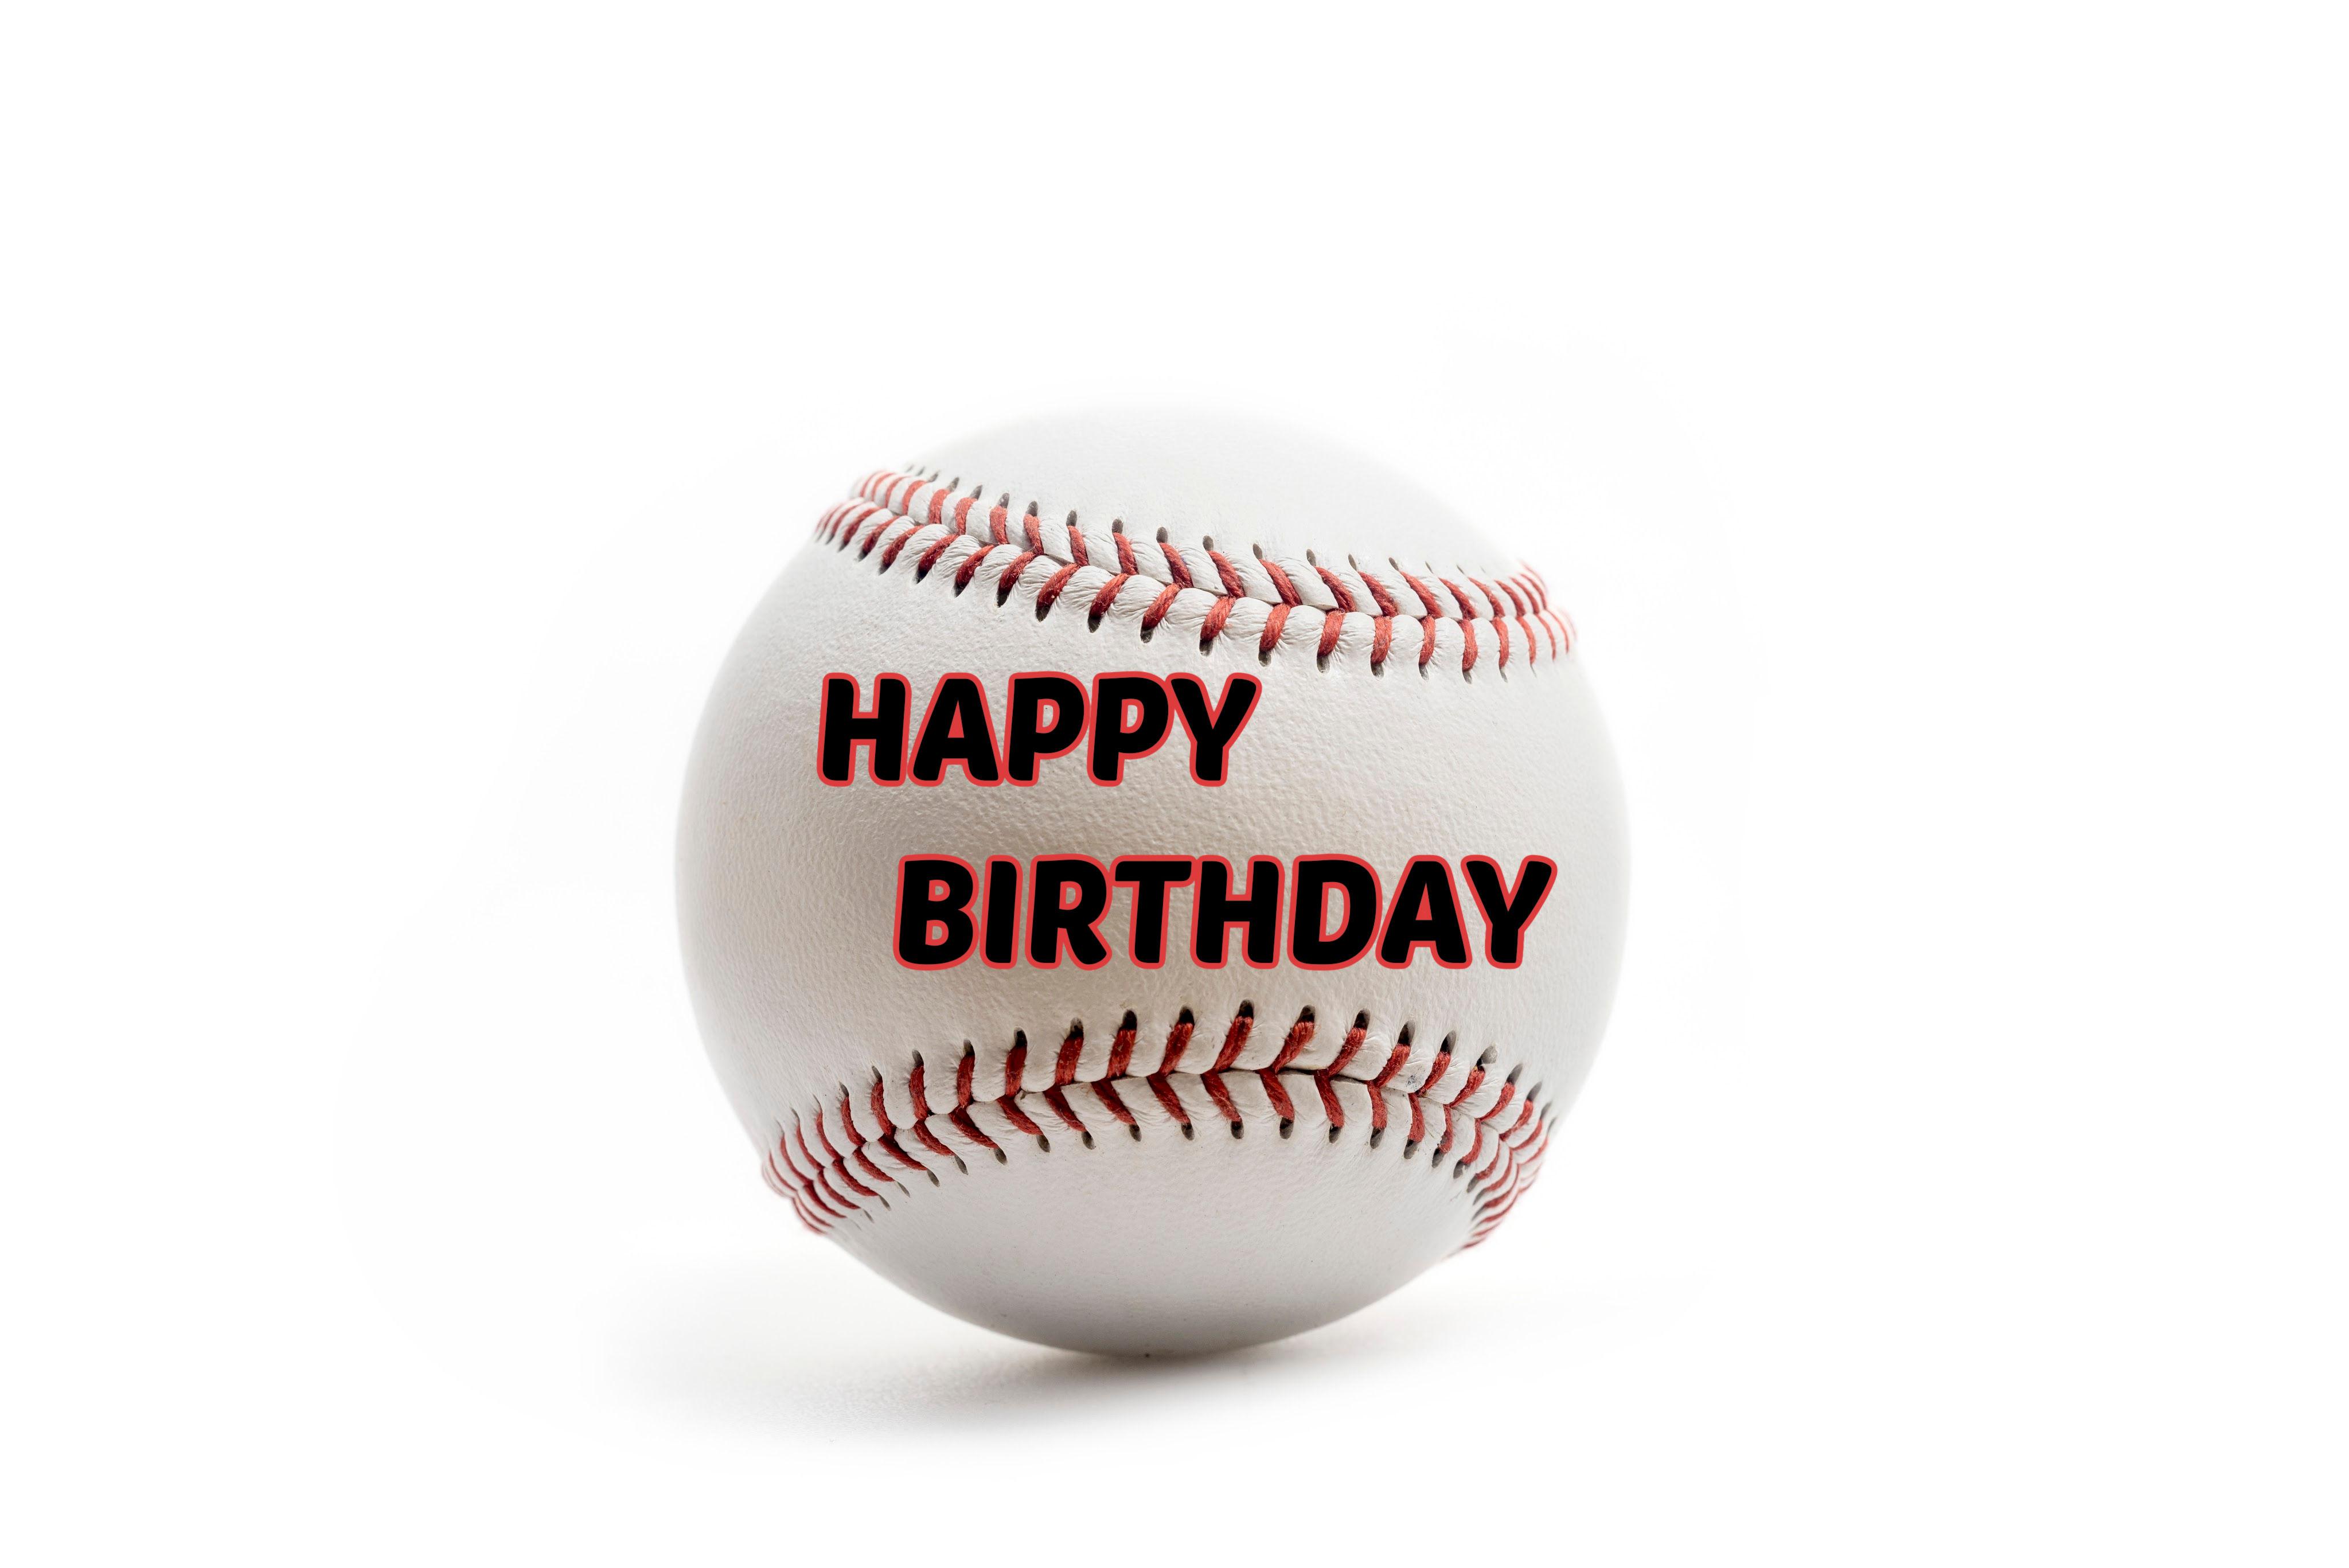 happy-birthday-baseball-theme